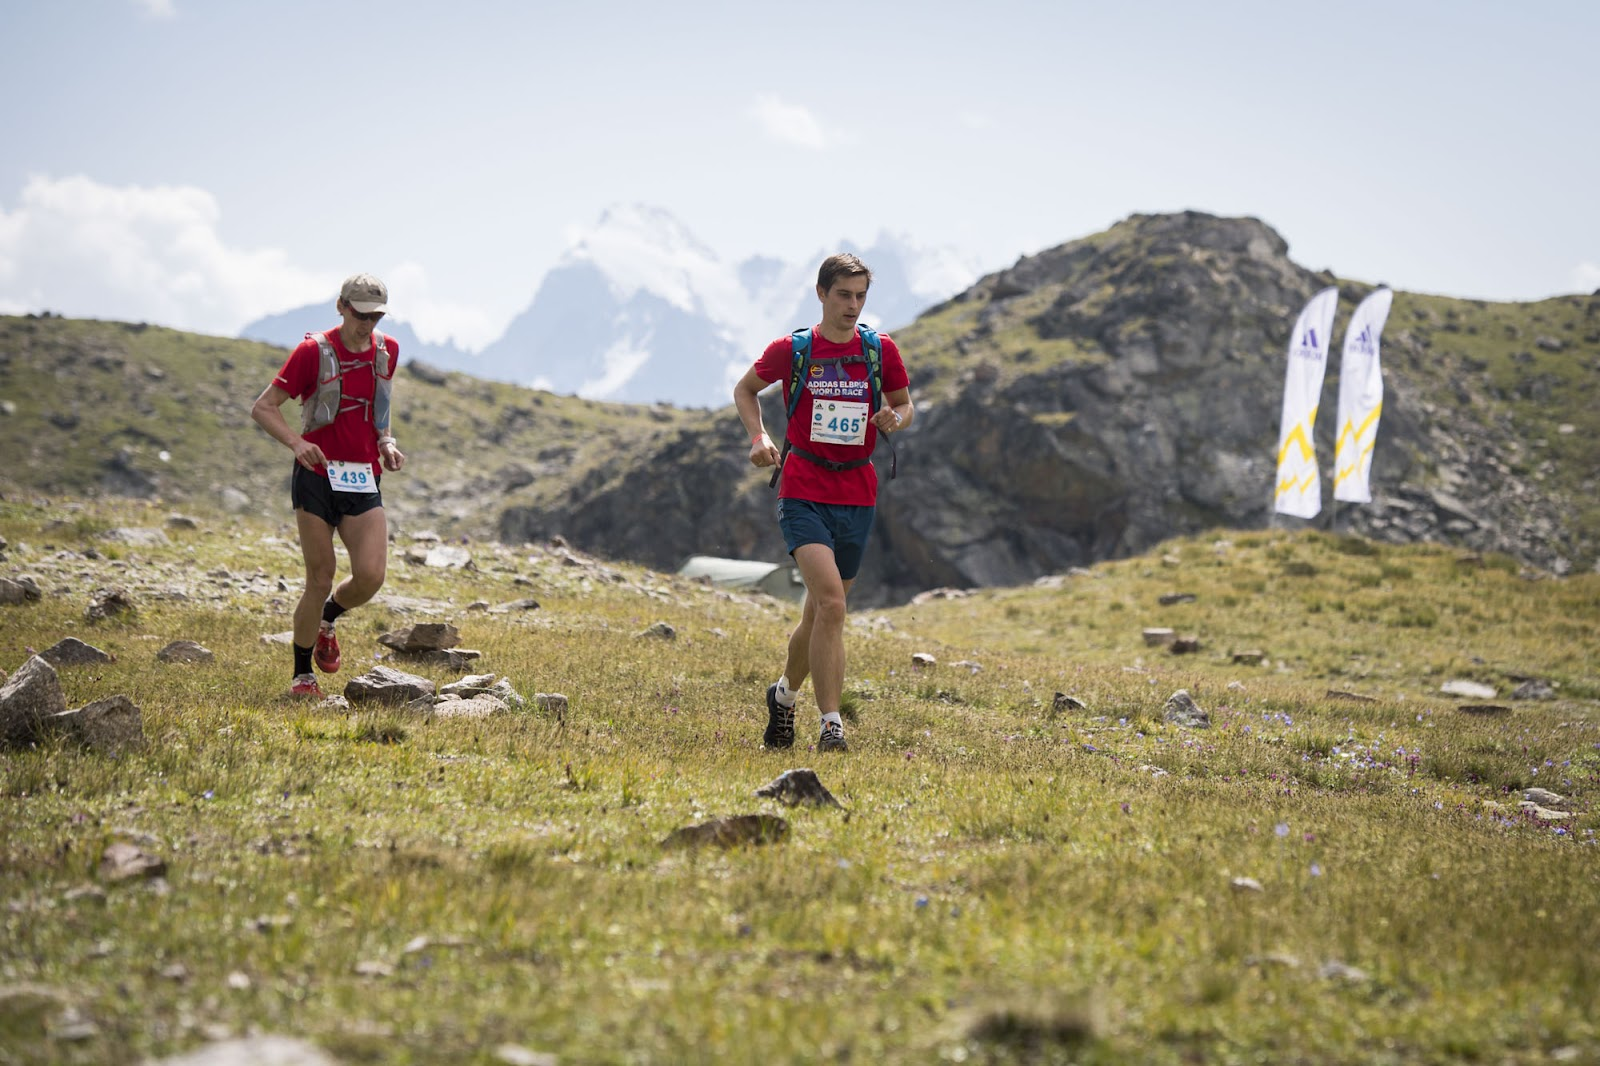 Suunto — титульный партнёр дистанции Suunto Elbrus Mountain Ultra 59 км